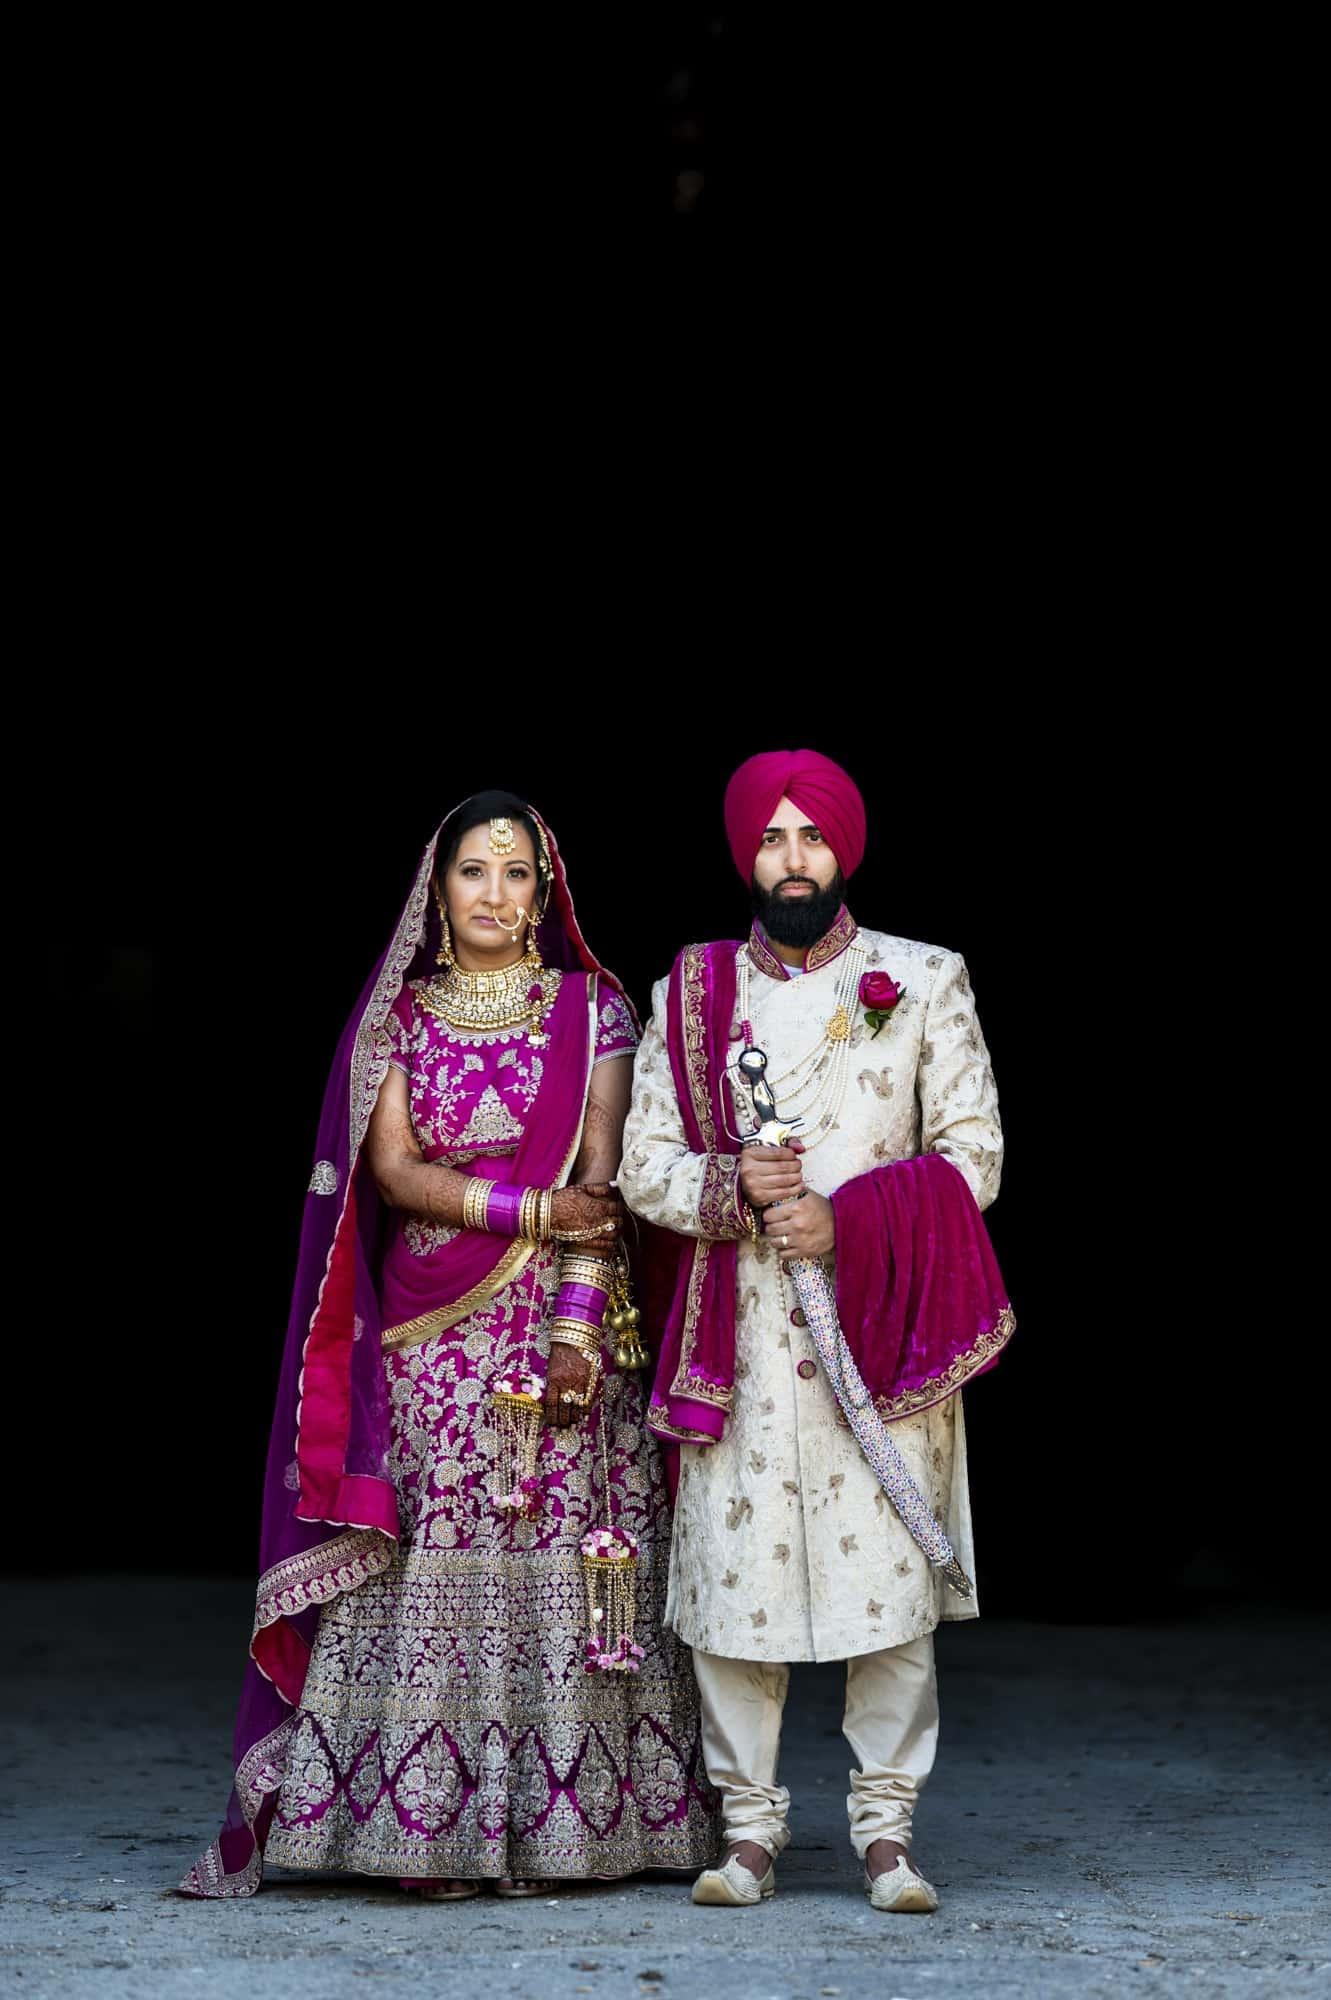 manny-gurdeep-wedding-blog2-148